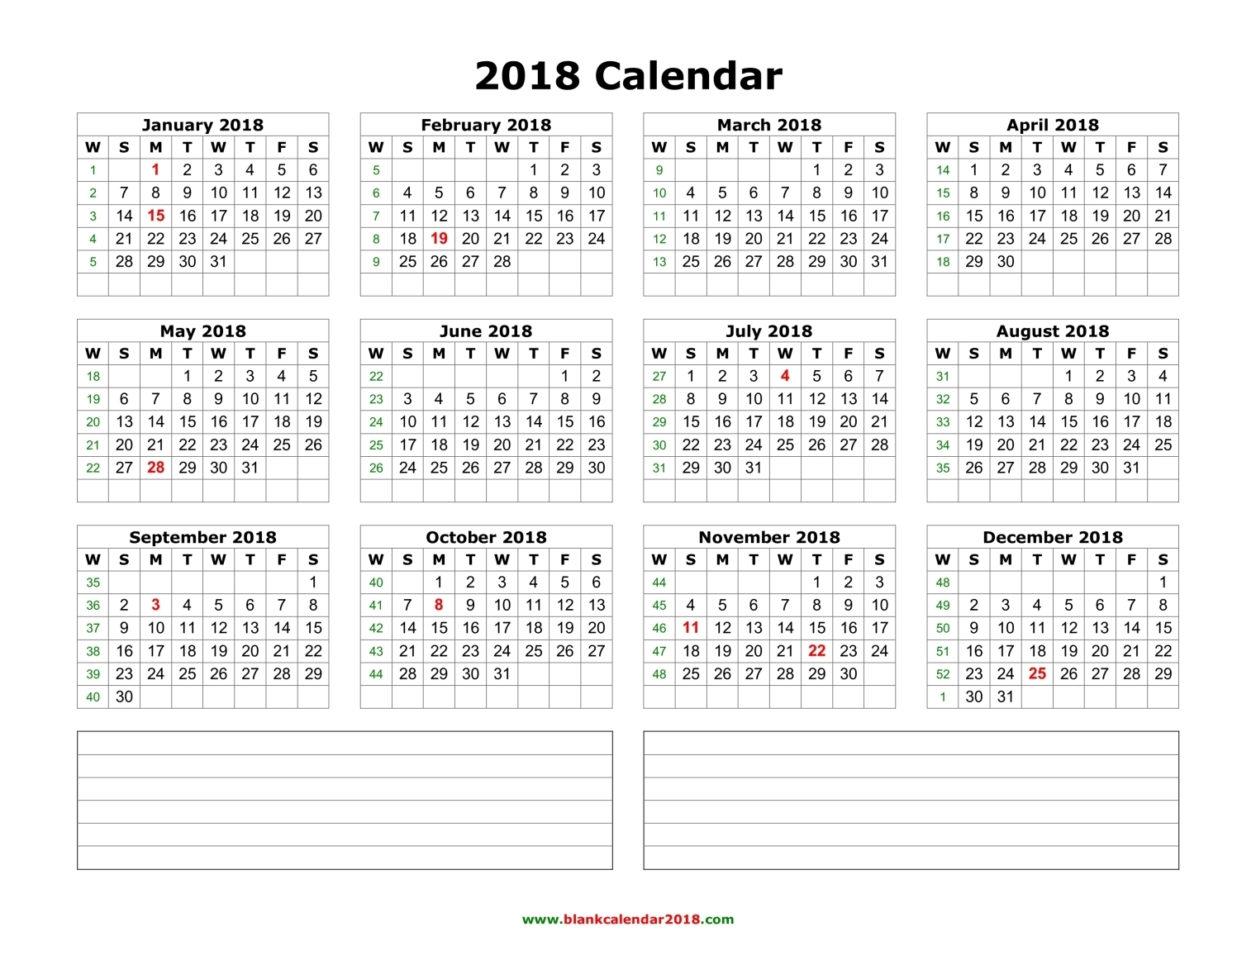 2018 Calendar Spreadsheet For Blank Calendar 2018